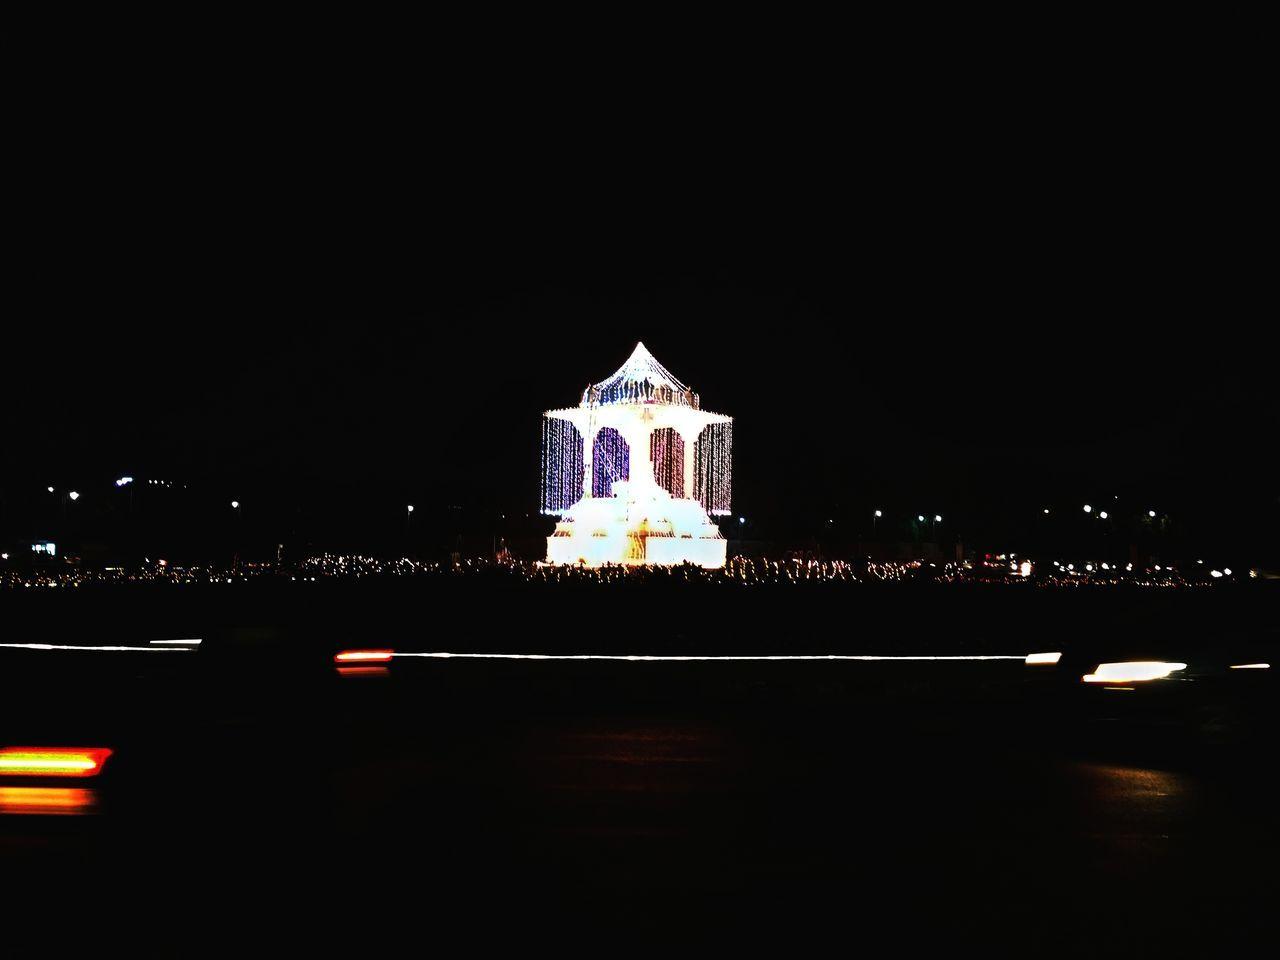 Illuminated Night Architecture Hidden Gems  Rare Lens - Eye Adapted To The City WinterWandering Neon Outdoors Dark No People Travel EpicFeeling Finding New Frontiers Biketour Travel Destinations Street City Jaipur1 Statuecircle The City Light